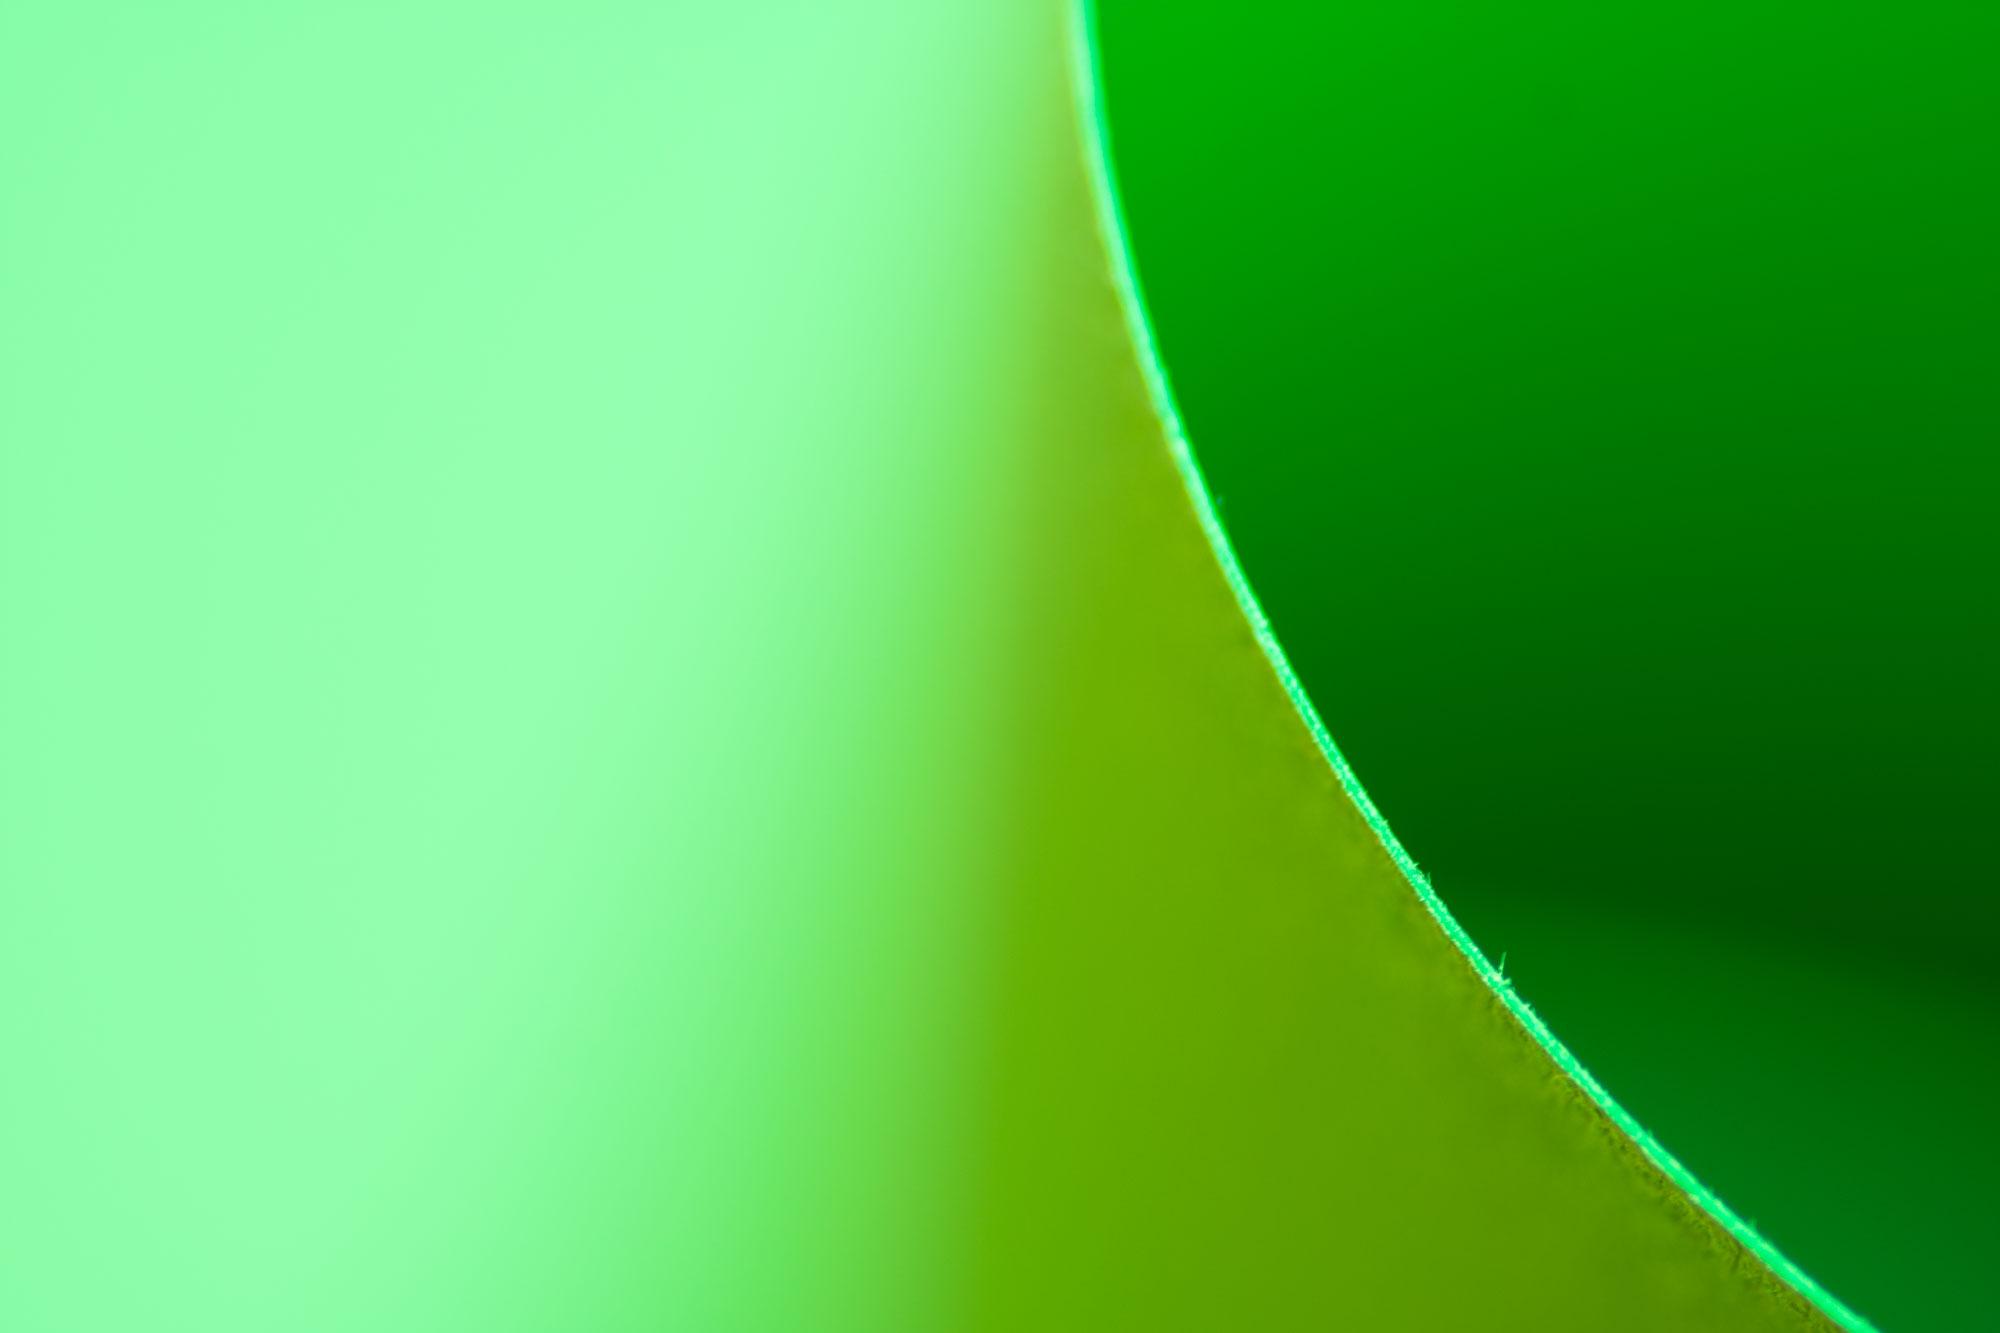 77. Green